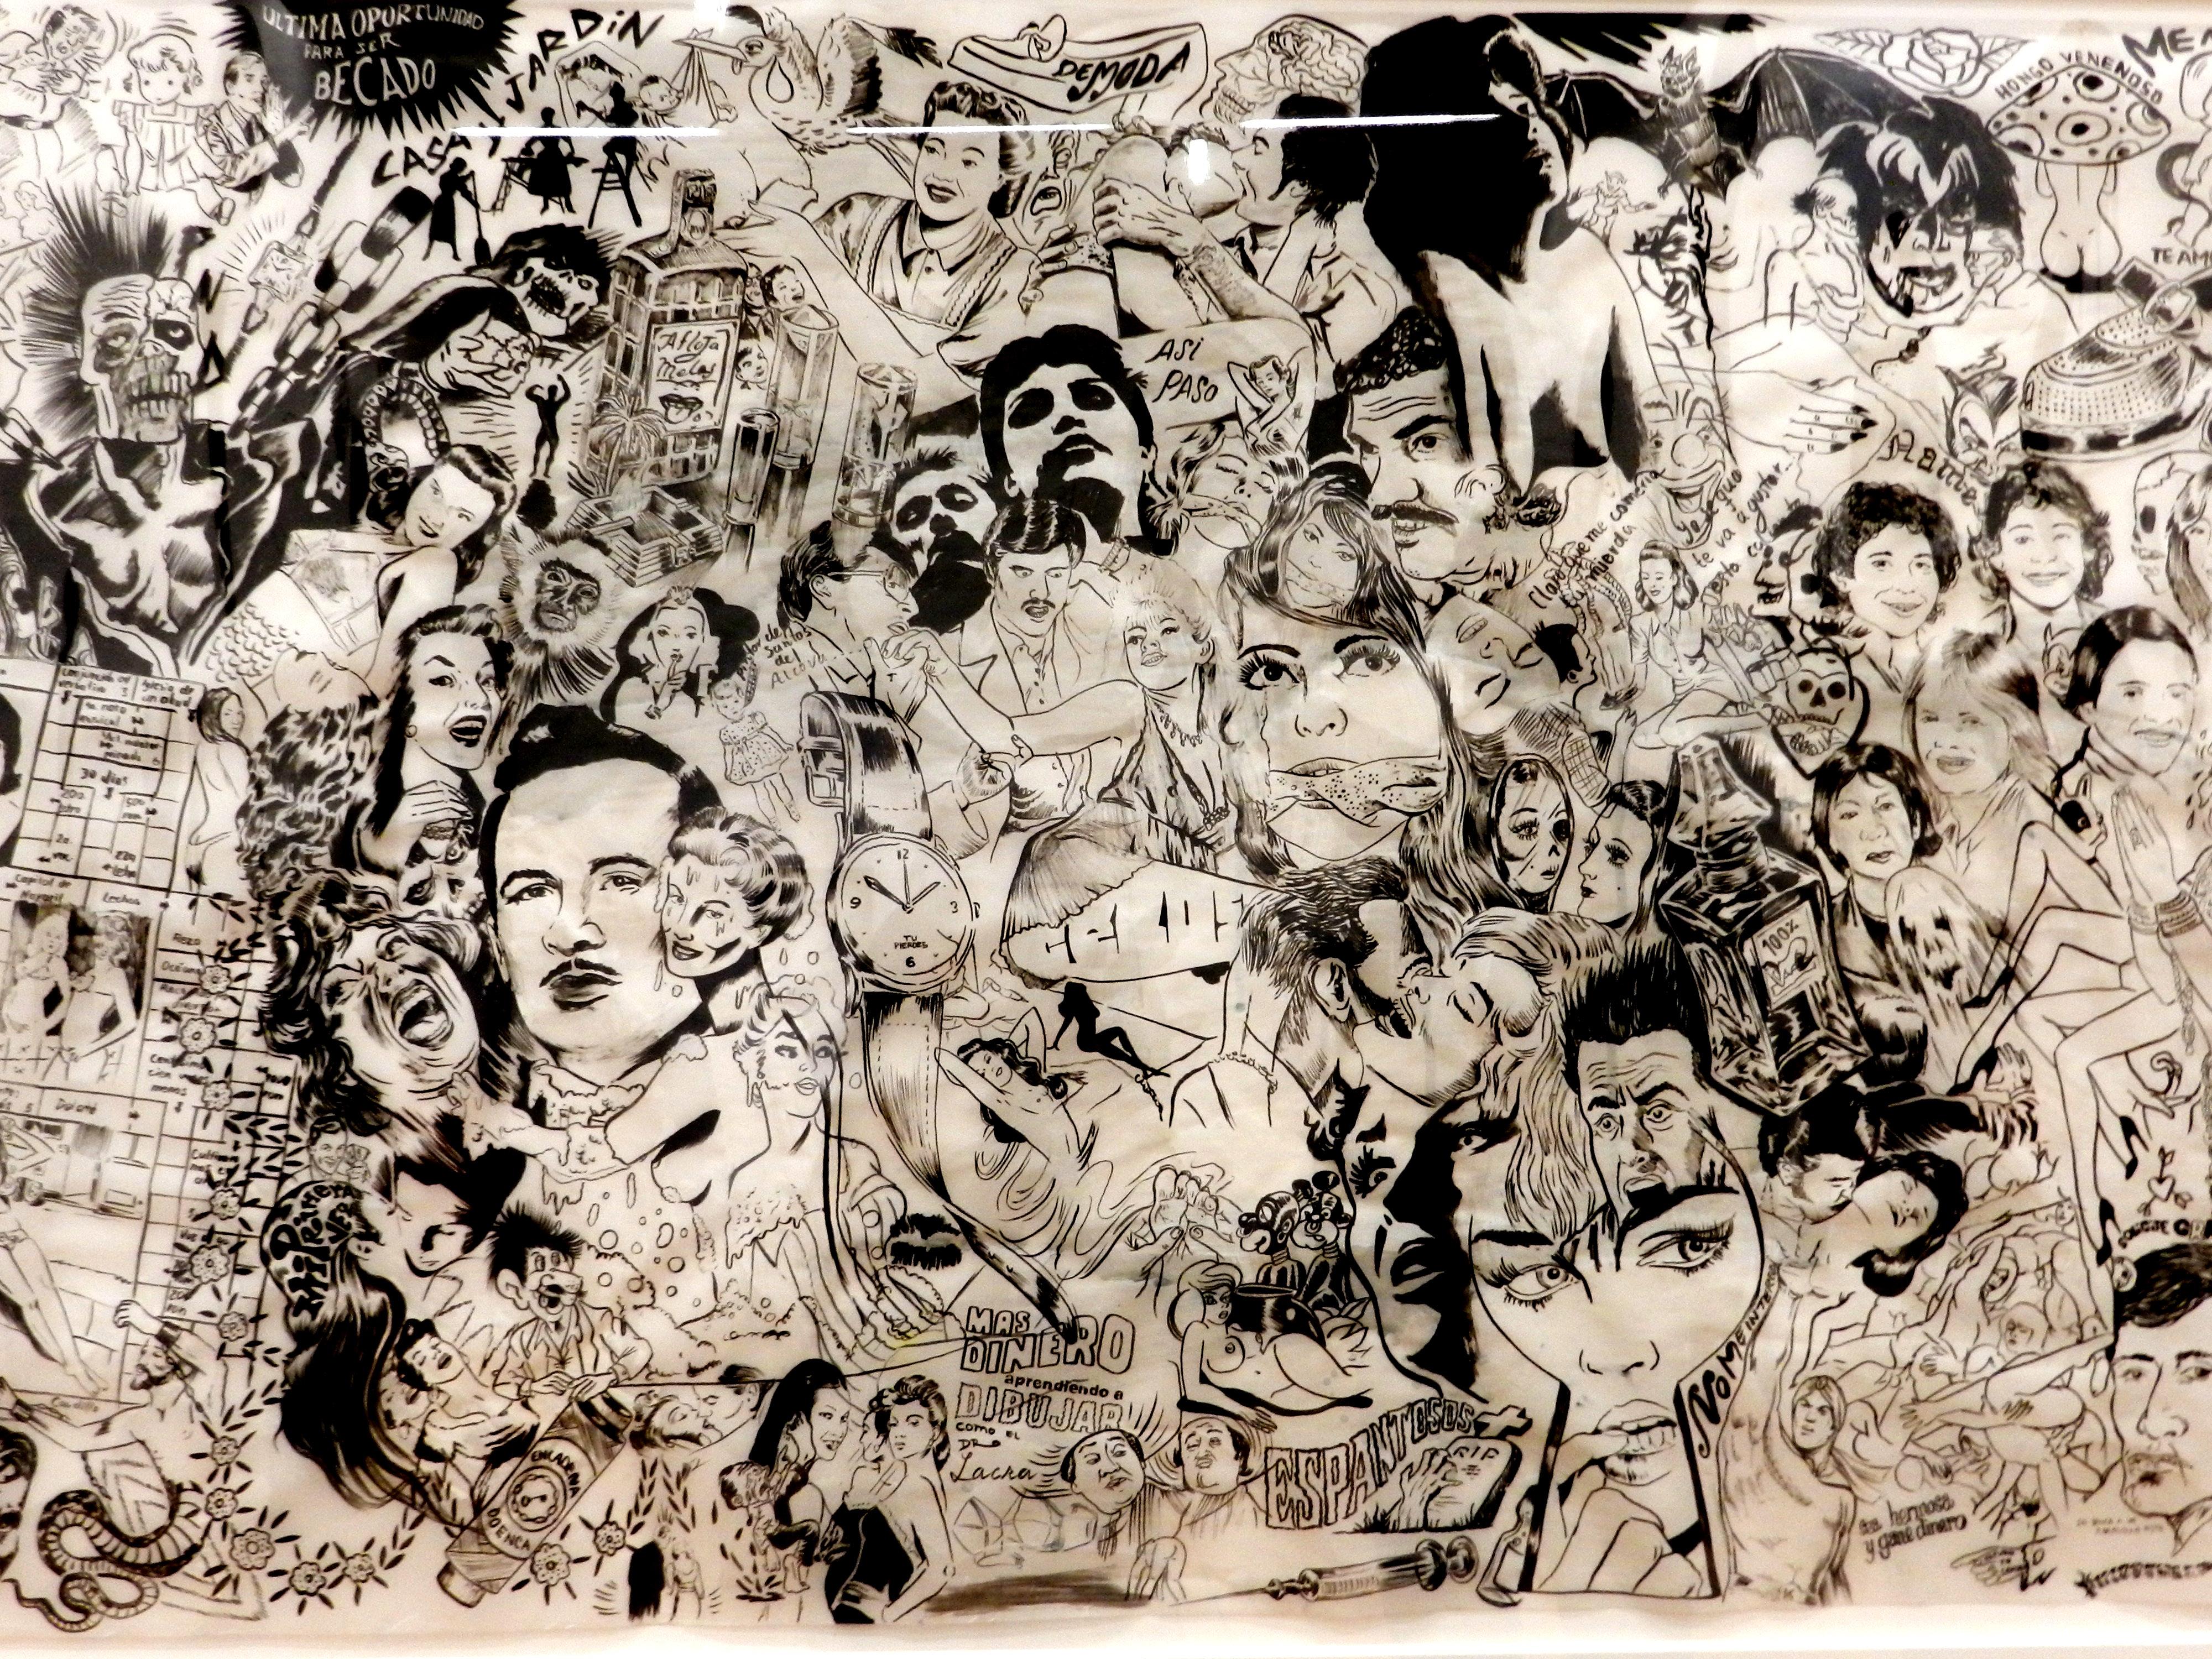 Dr. Lakra - tinta negra sobre fondo blanco con personajes de cultura popular